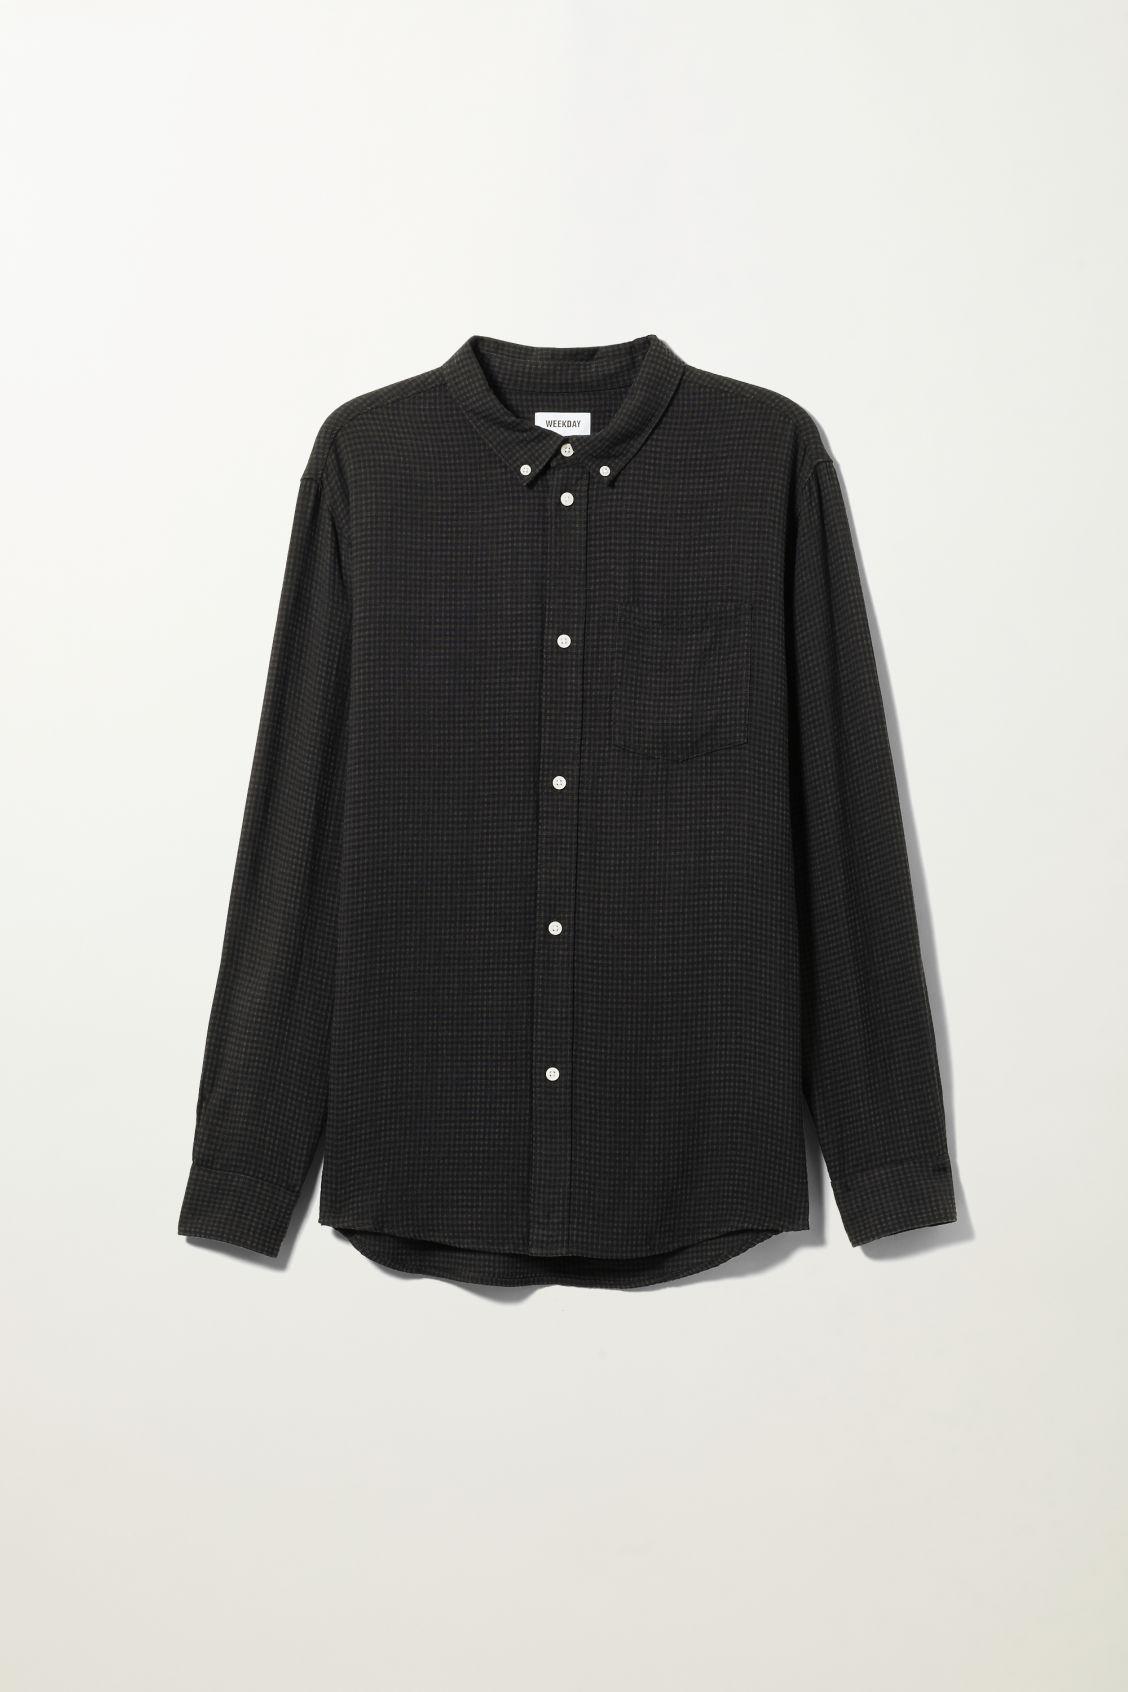 Malcon Structured Shirt - Black